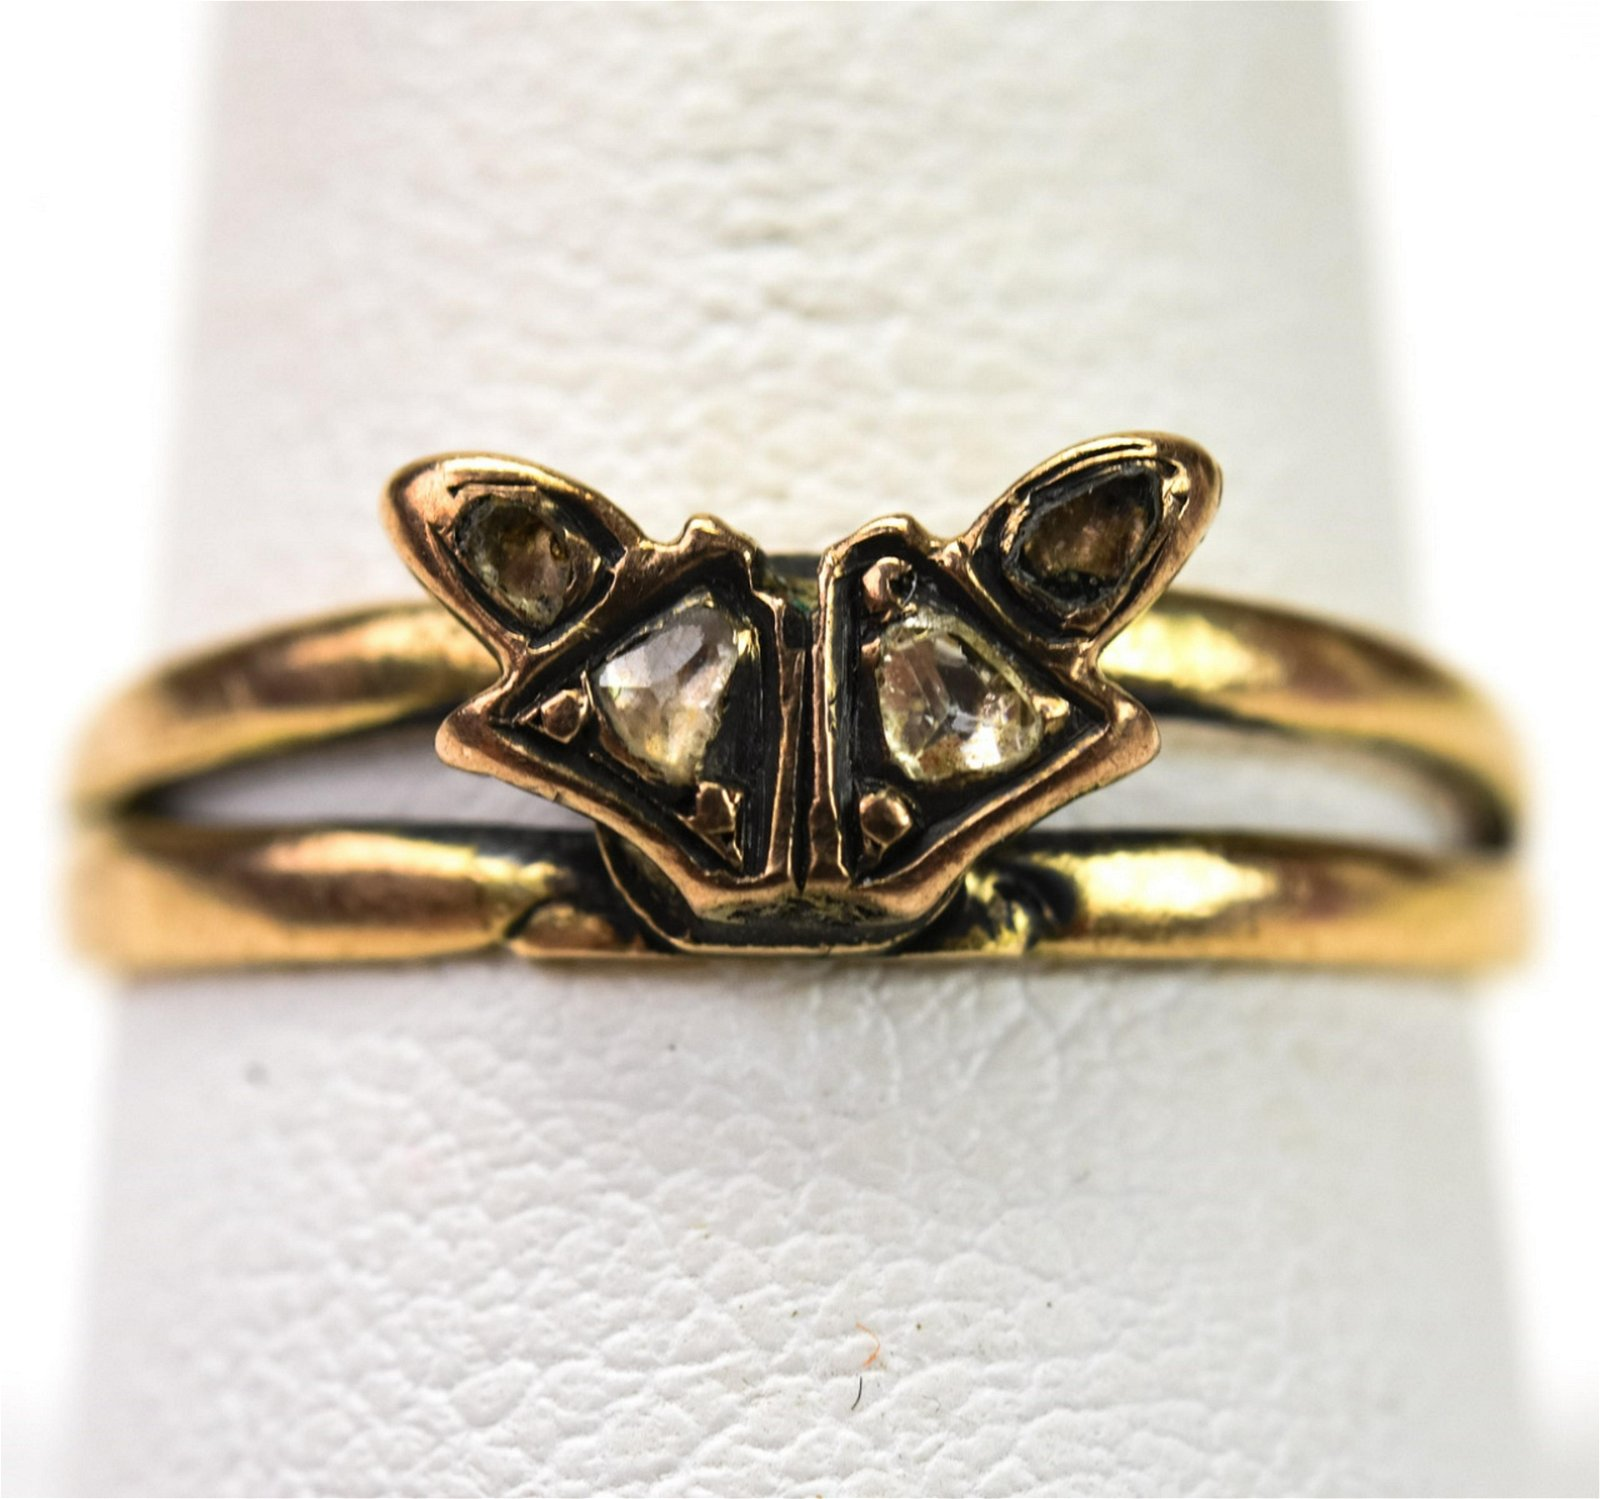 Antique Georgian 14k Gold & Rose Cut Diamond Ring